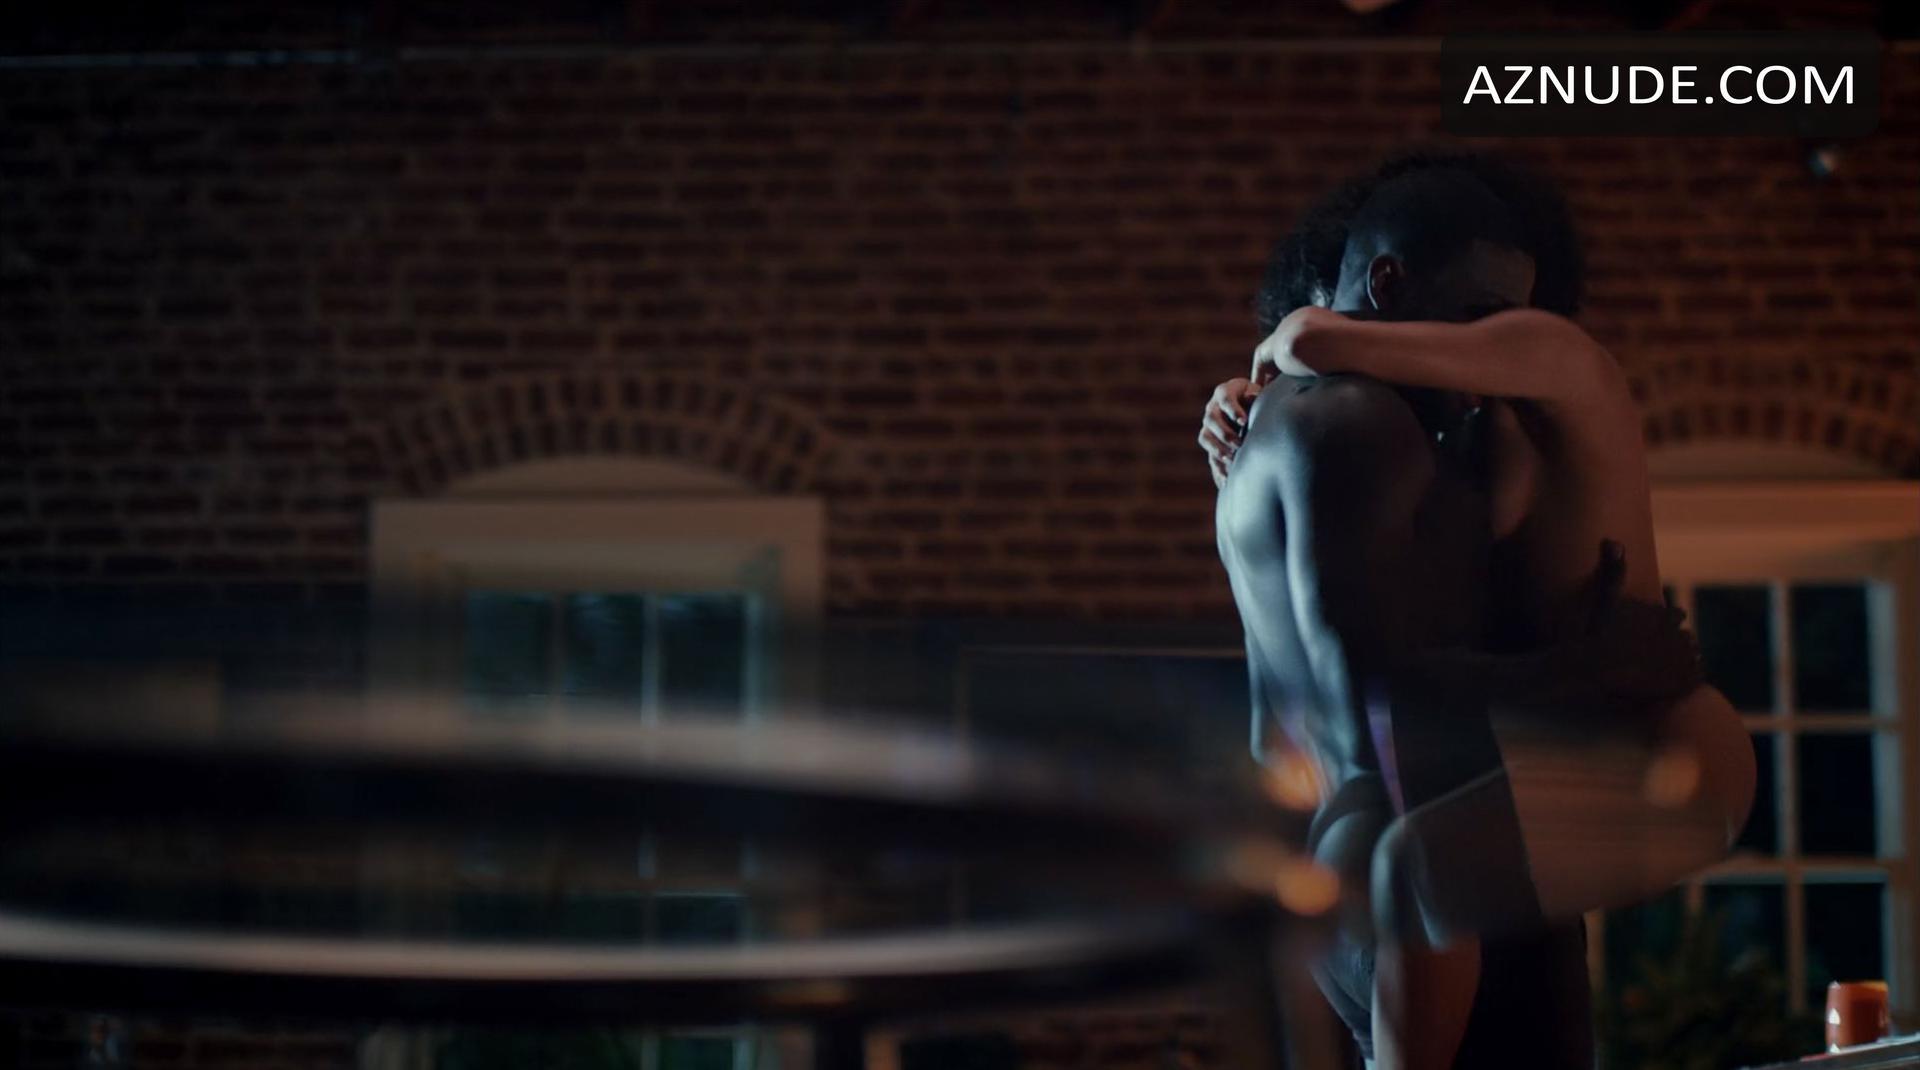 Angelina jolie michelle williams sarah silverman nude hd 1